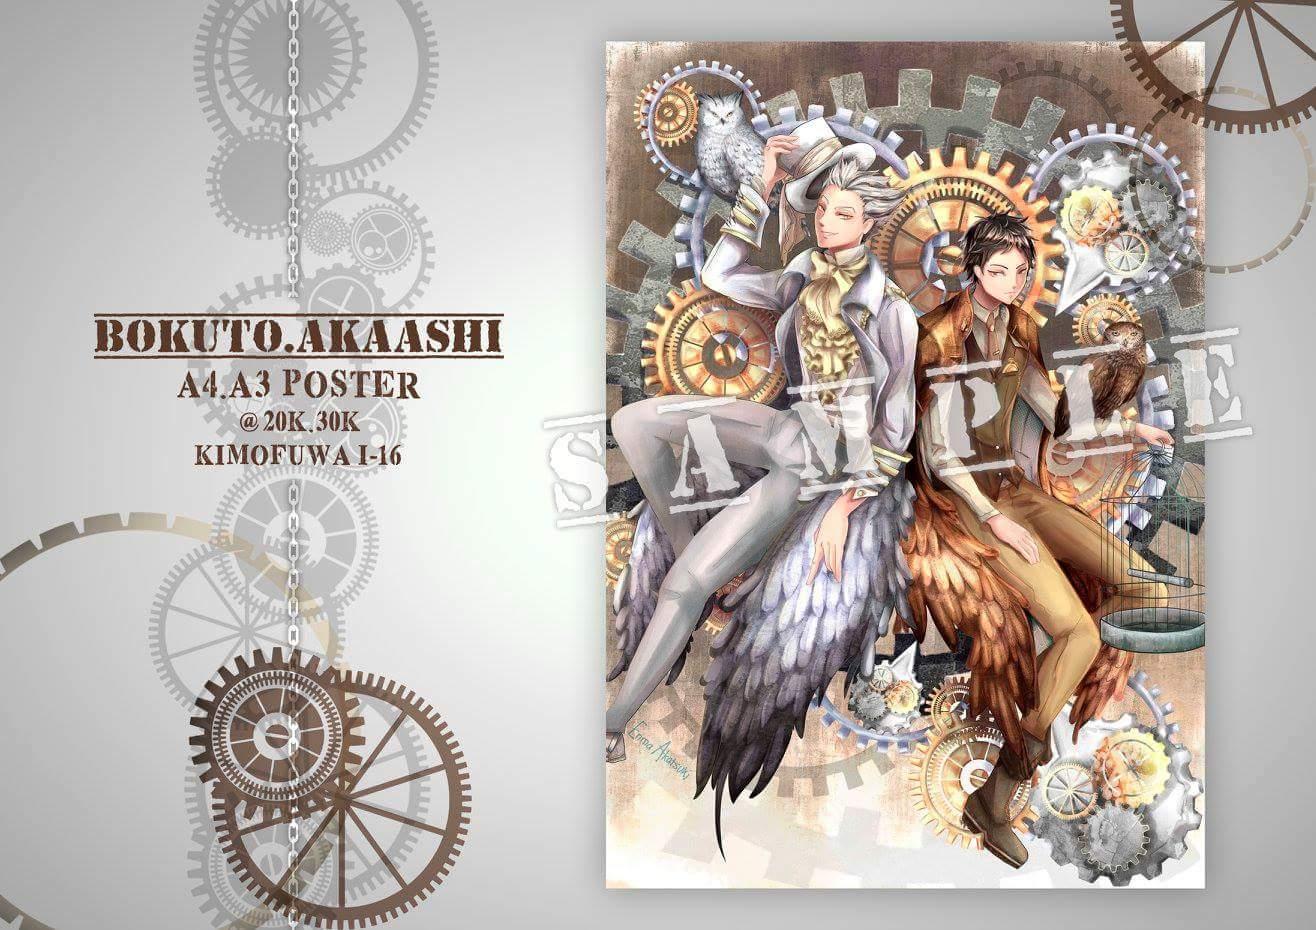 Design poster k3 - Akira Ll Cf9 K3 4 On Twitter Poster Design By Enma_akatsuki Visit Us At Comifuro7 I 16 Haikyuu Tokyoghoul Comifuro